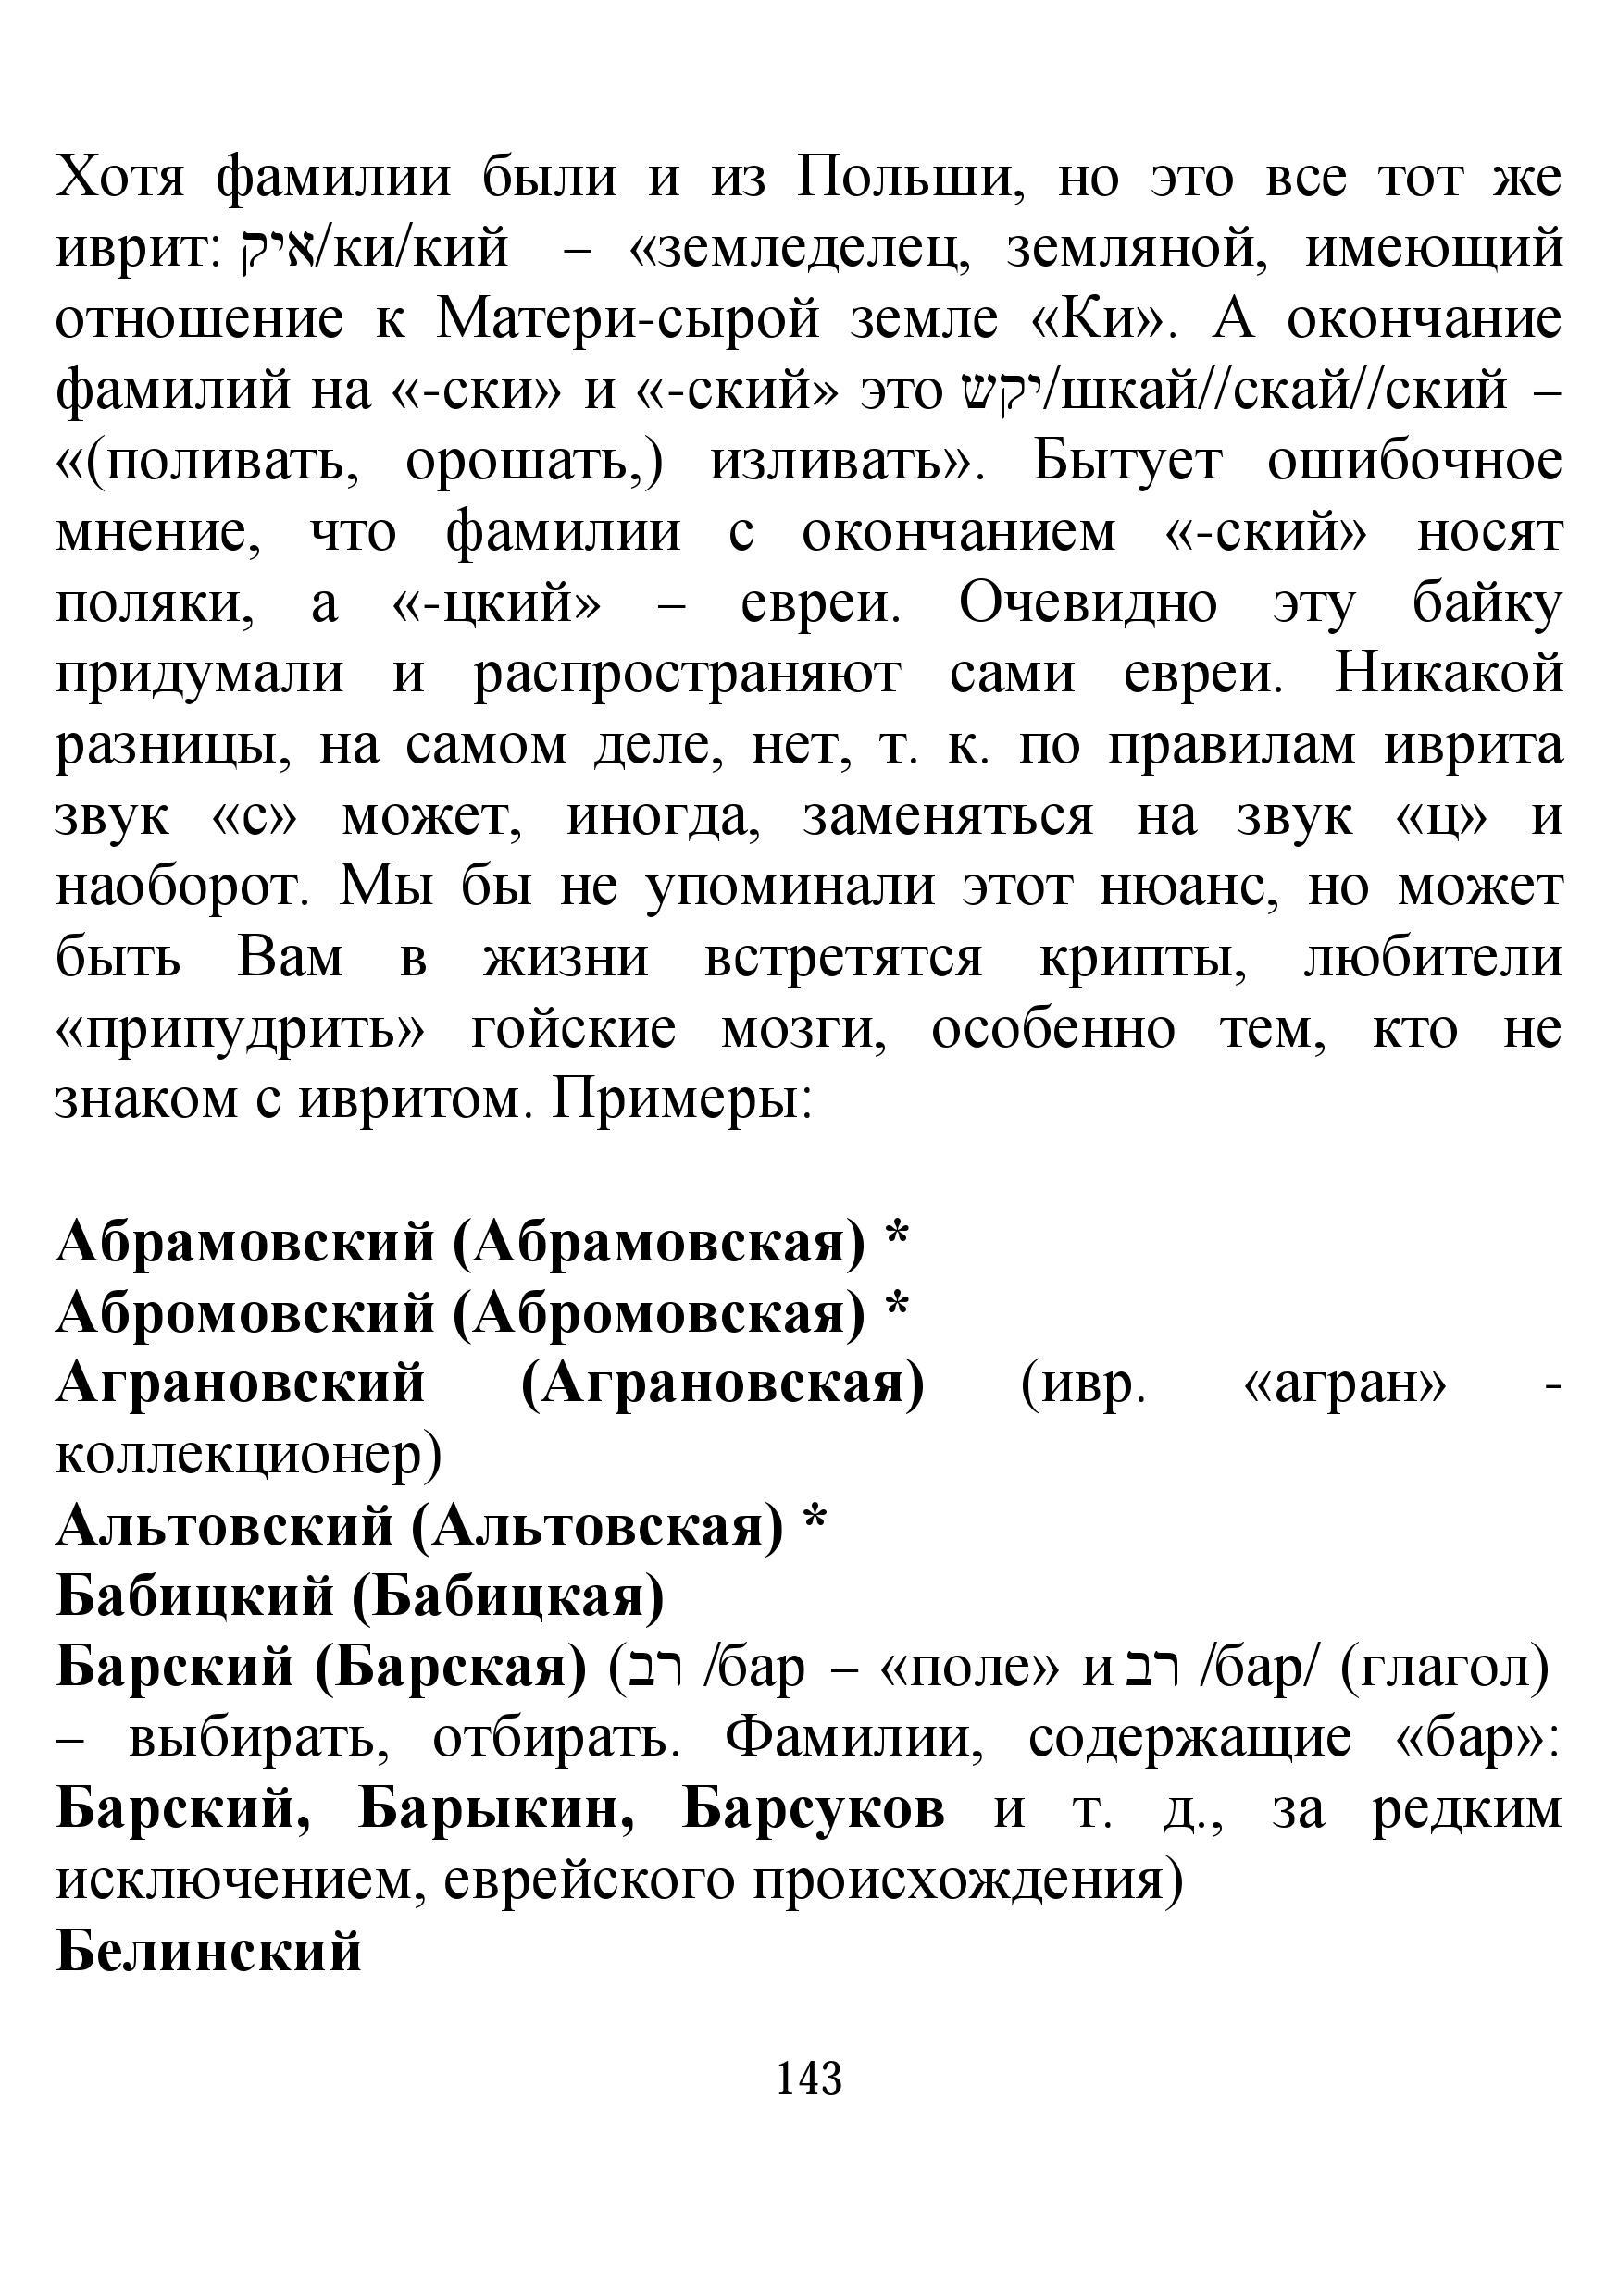 http://sg.uploads.ru/6p4vj.jpg